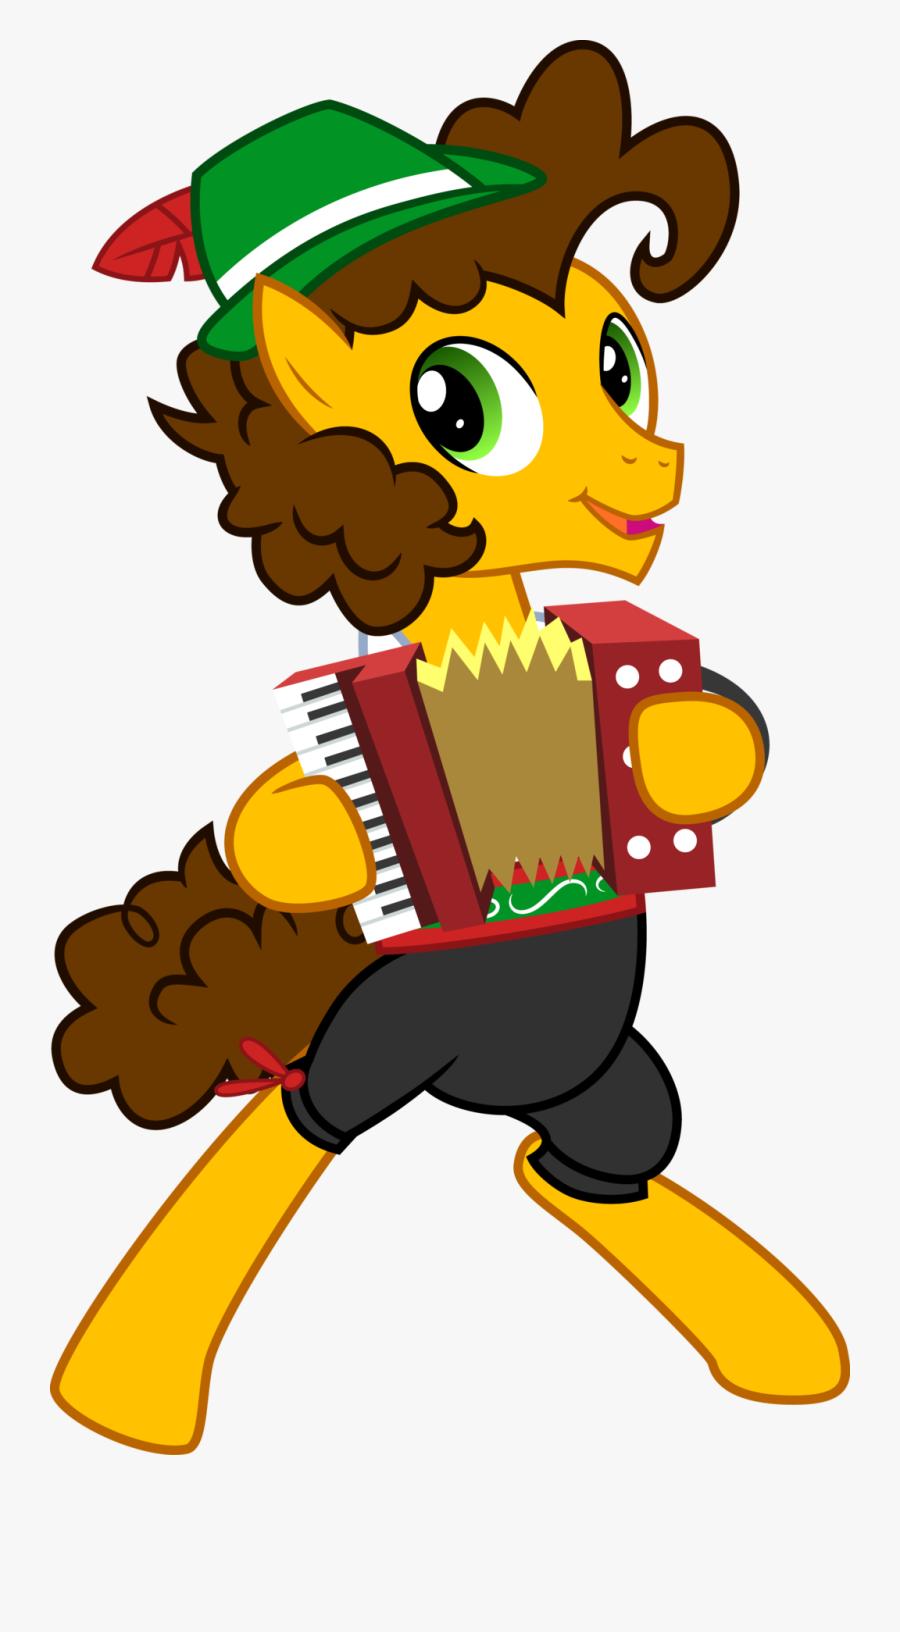 Banner Transparent Polka Clipart Accordion Player - Cheese Sandwich Accordion Mlp, Transparent Clipart